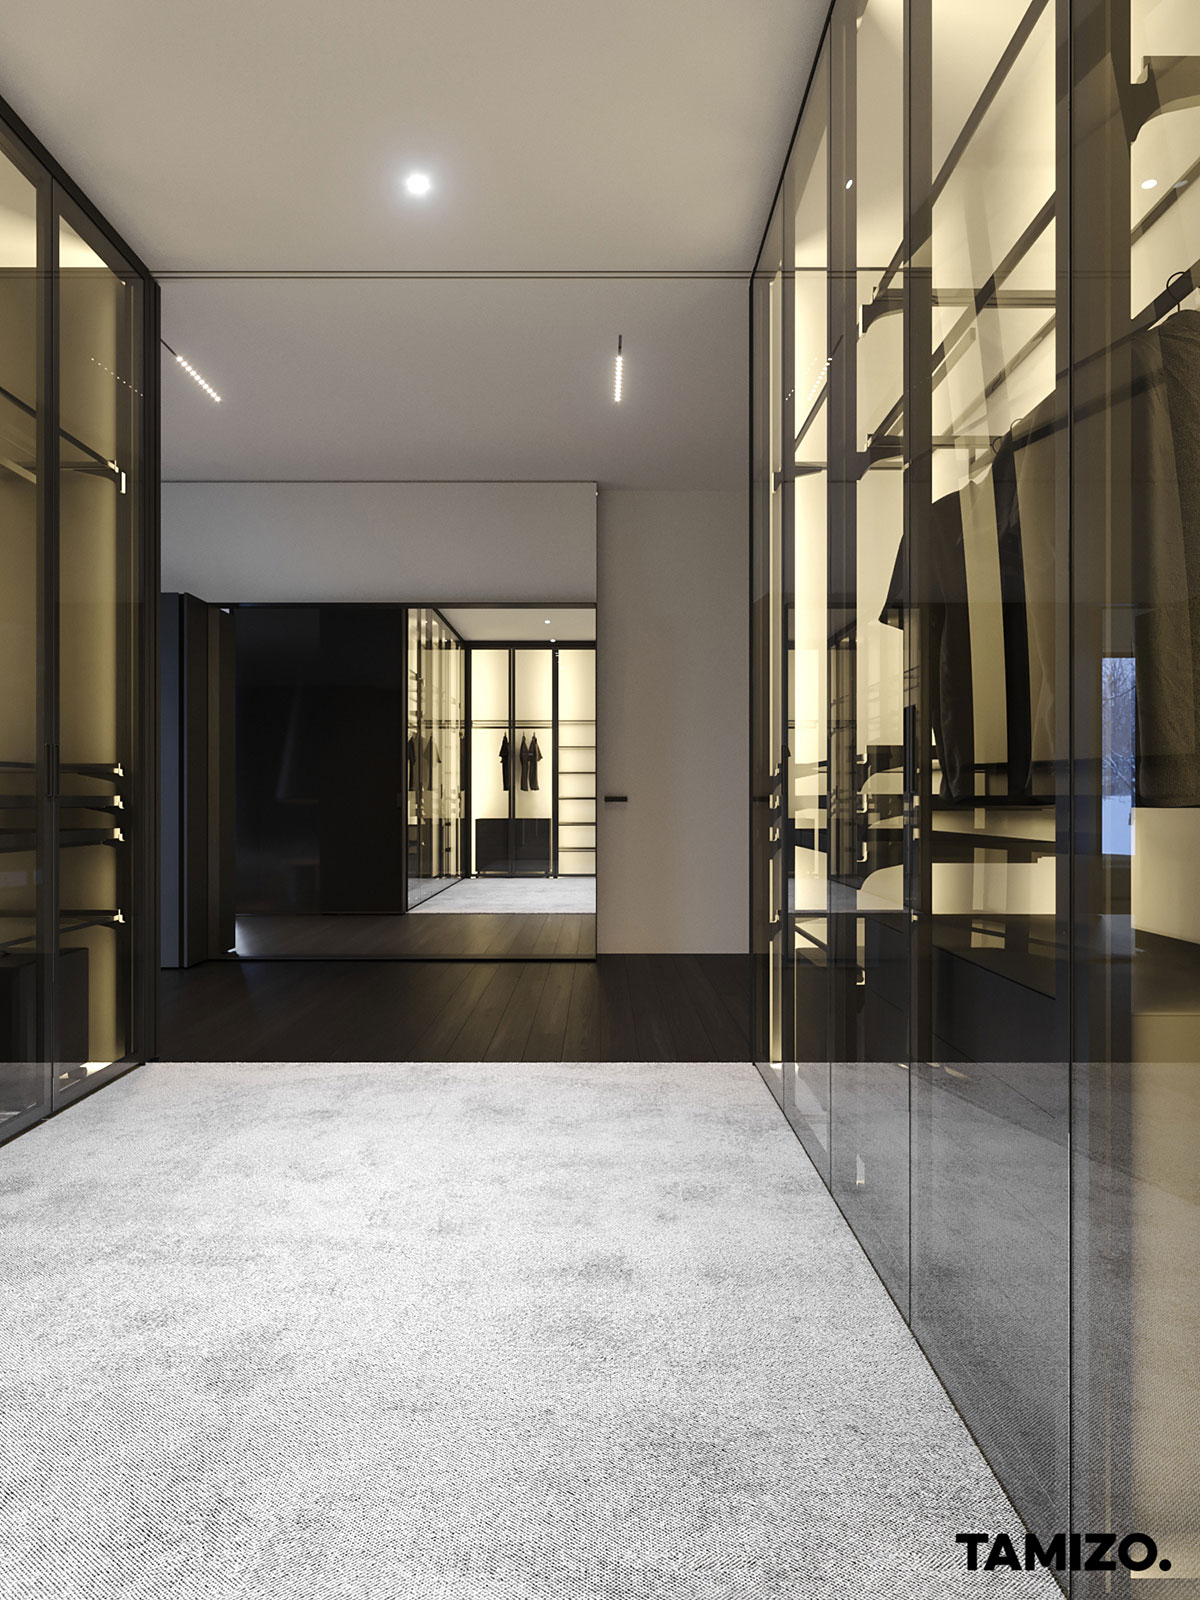 tamizo_architects_mateusz_kuo_stolarski_tomaszow_mazowiecki_interior_design_house_minimal_10